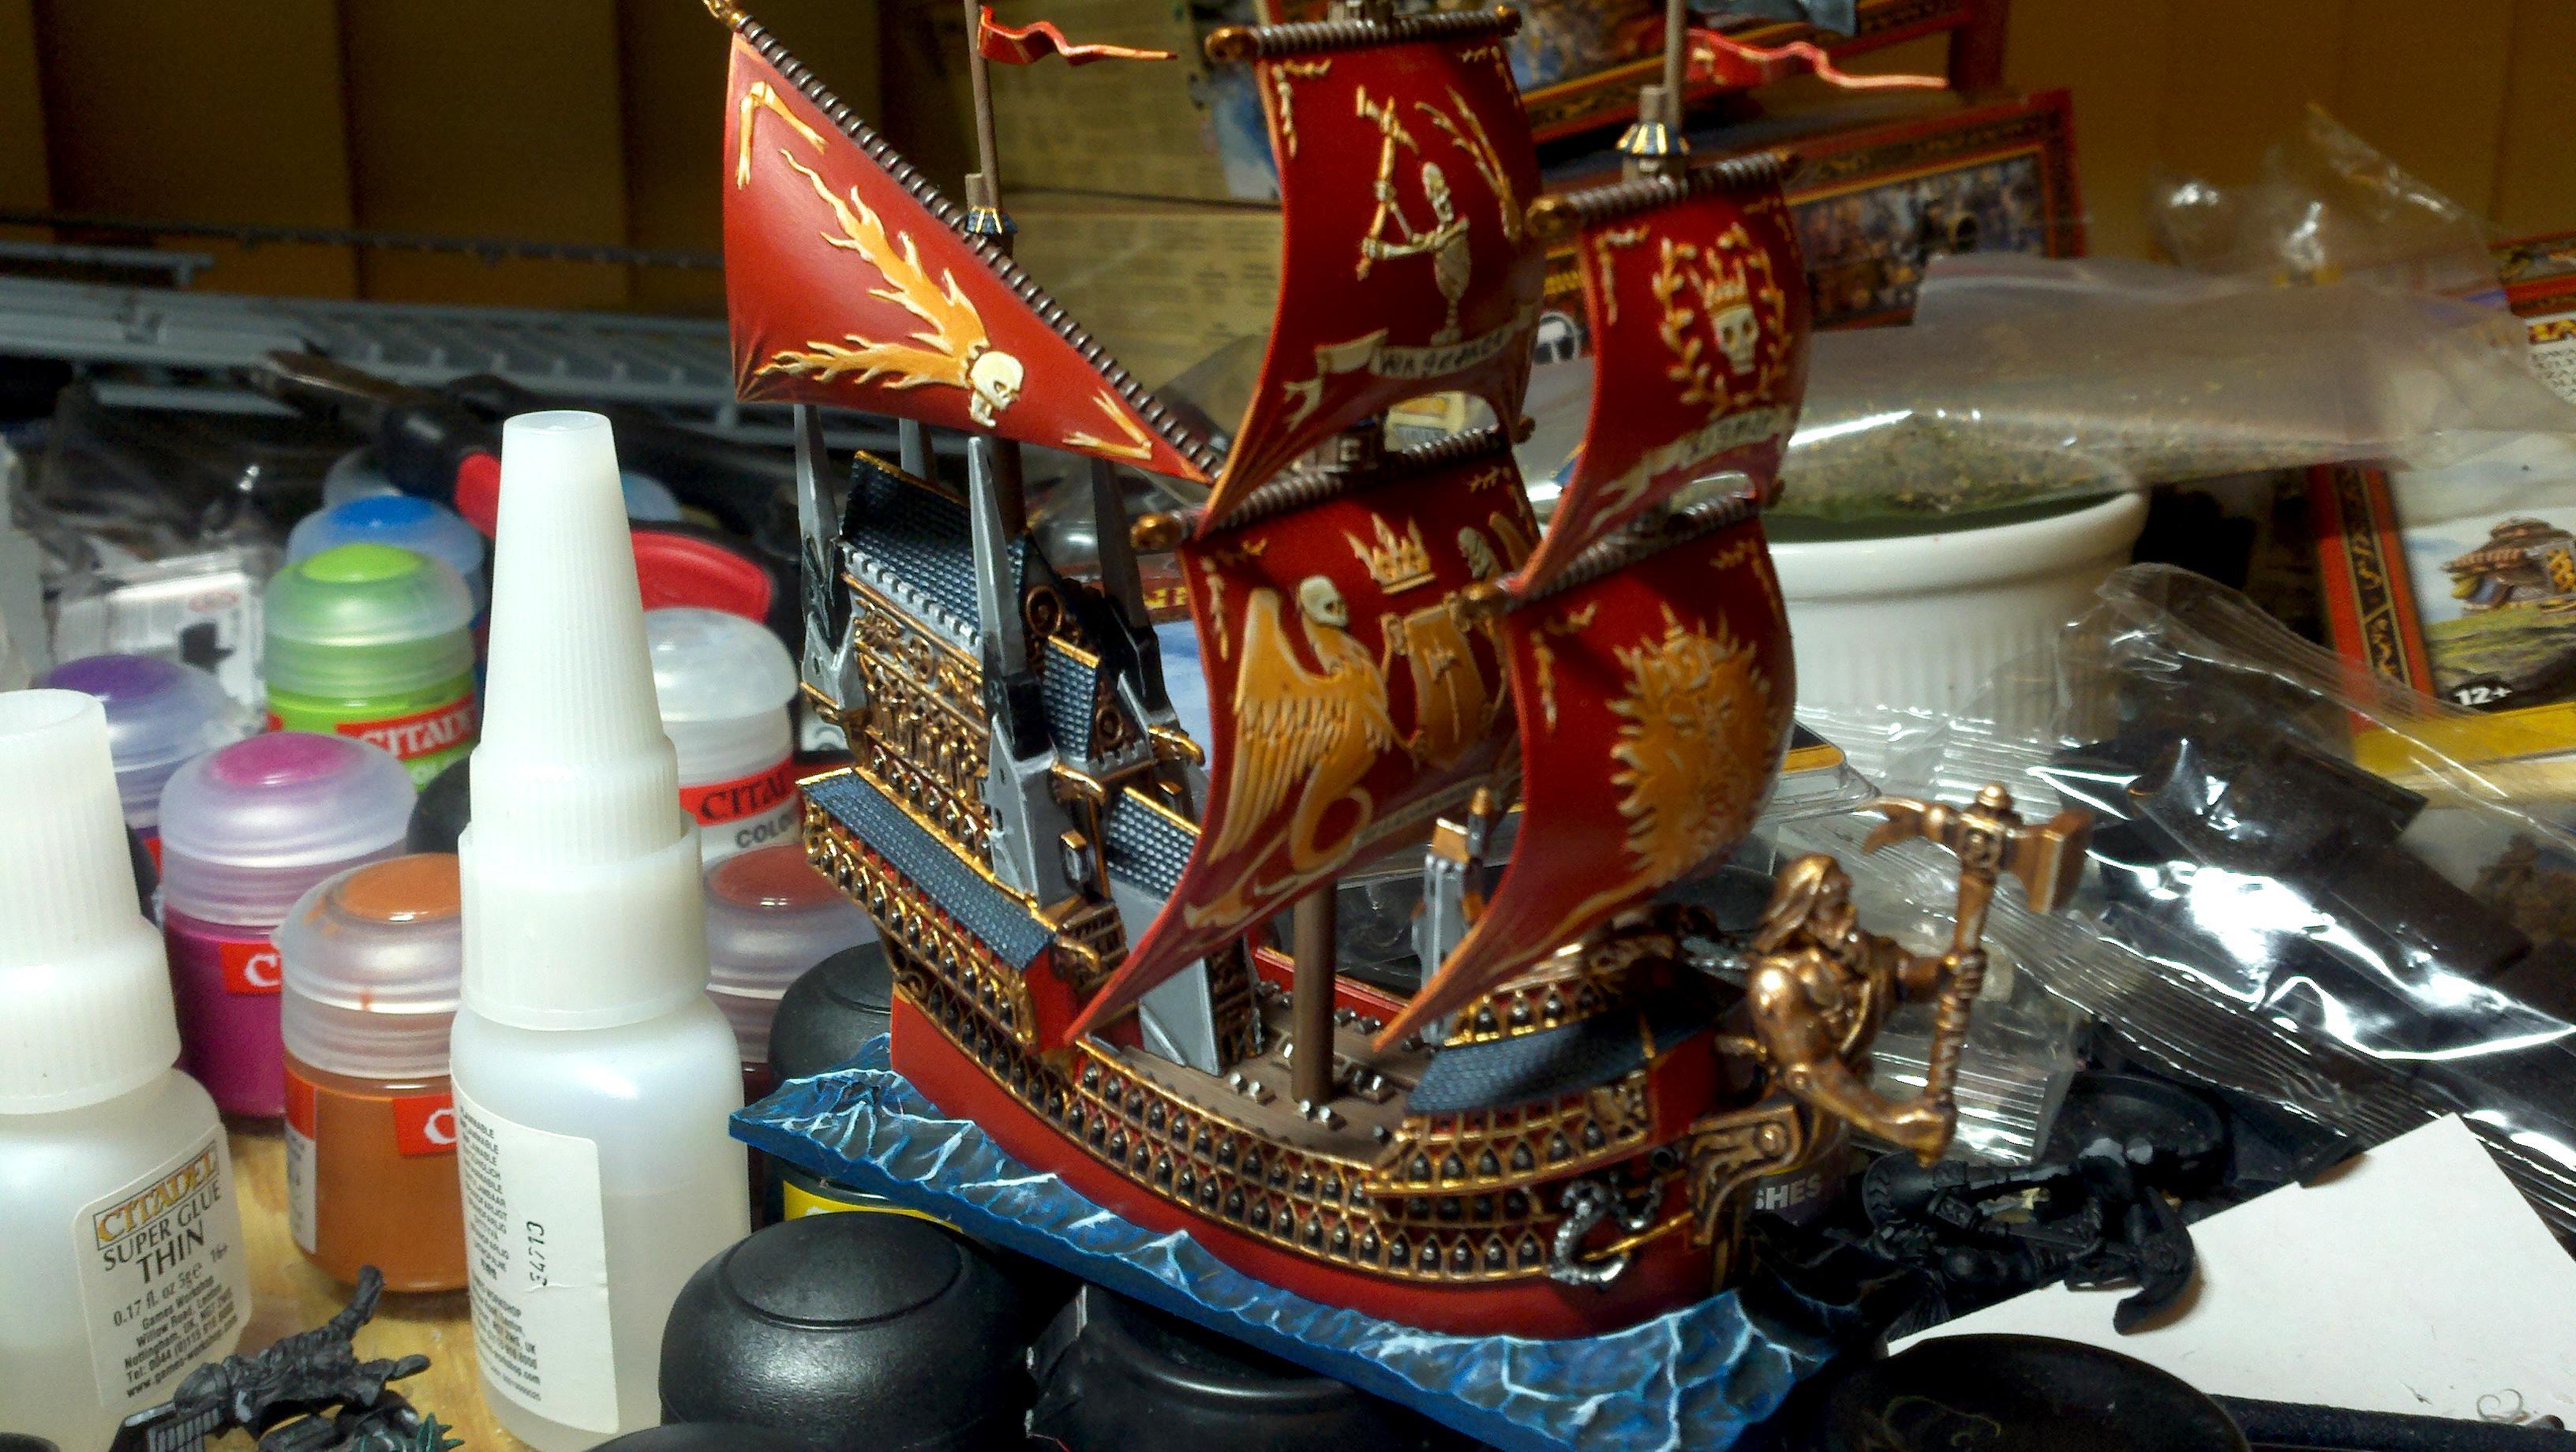 Captain Jaego Roth, Dreadfleet, Helden Hammer, Pirate, Pirates, Sea, Ship, Yar